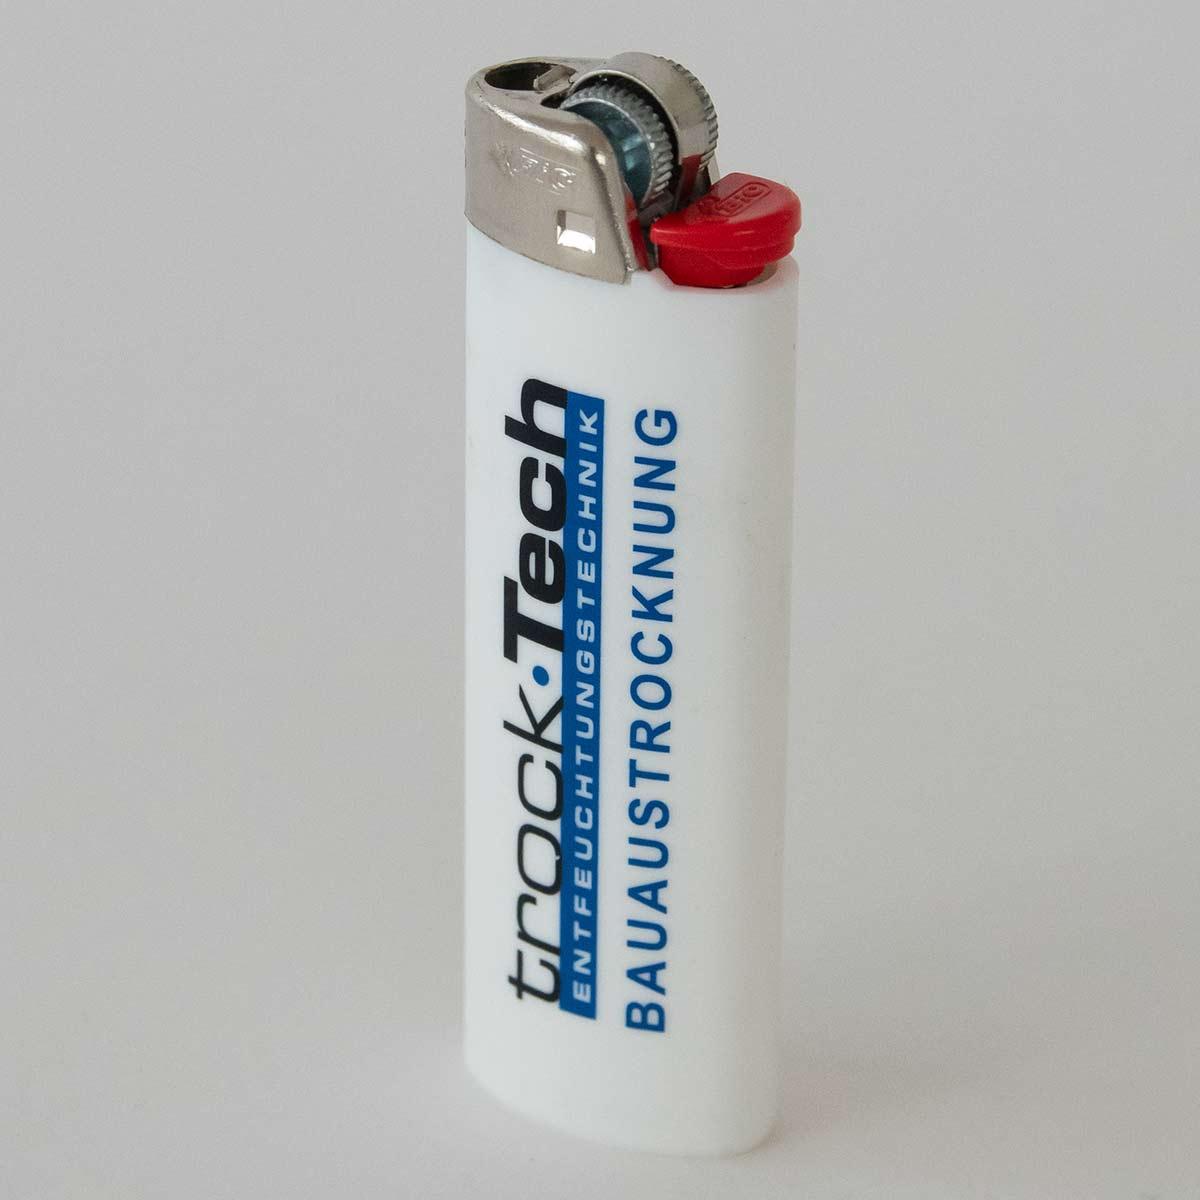 Juerg Siegrist AG - BIC Feuerzeug Trocktech